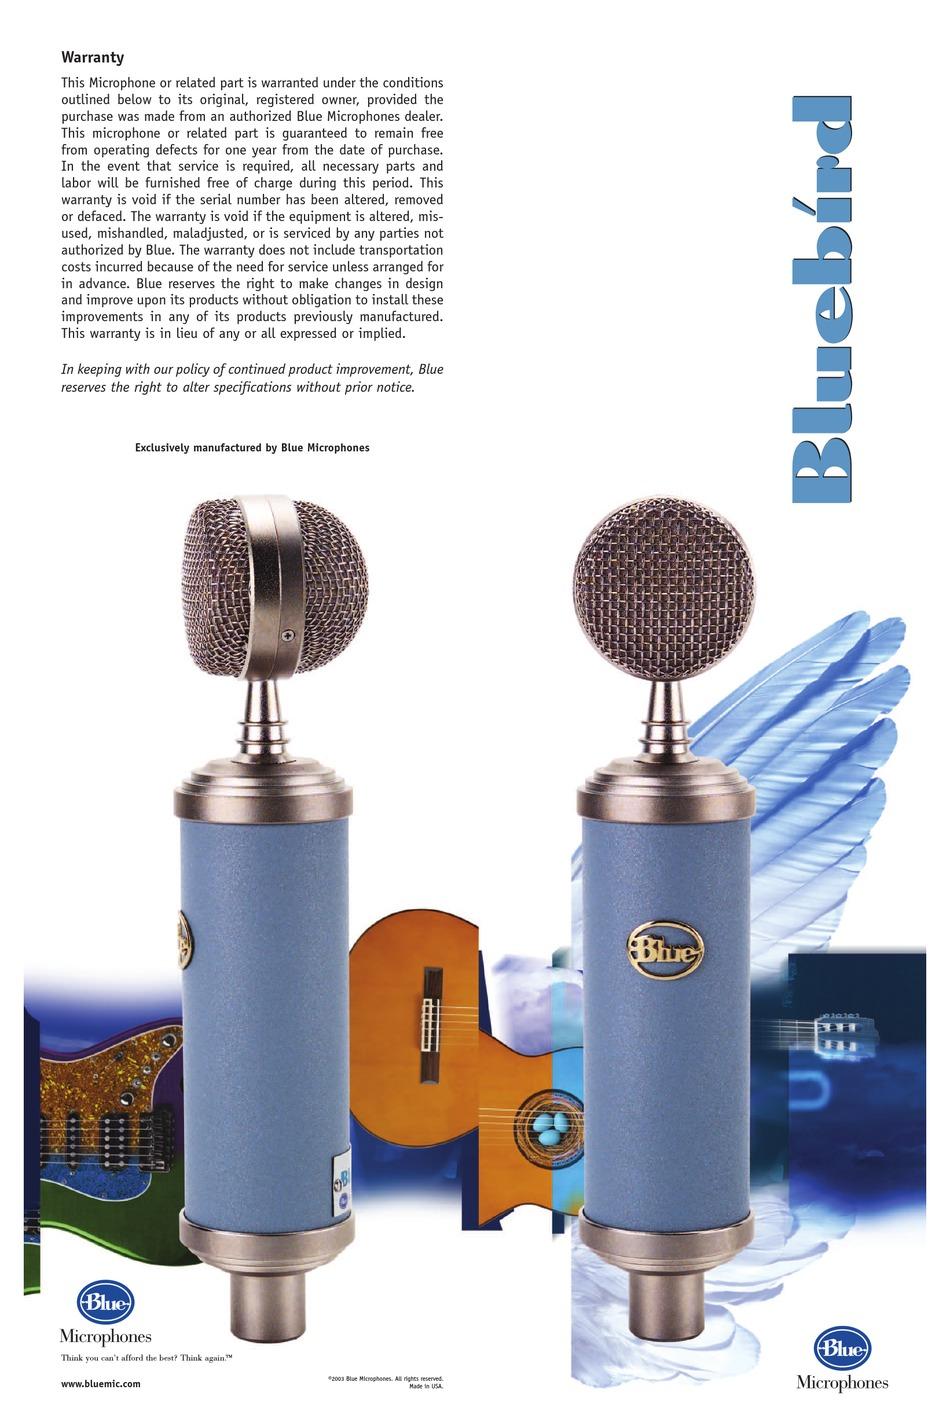 BLUE BLUEBIRD USER MANUAL Pdf Download | ManualsLib